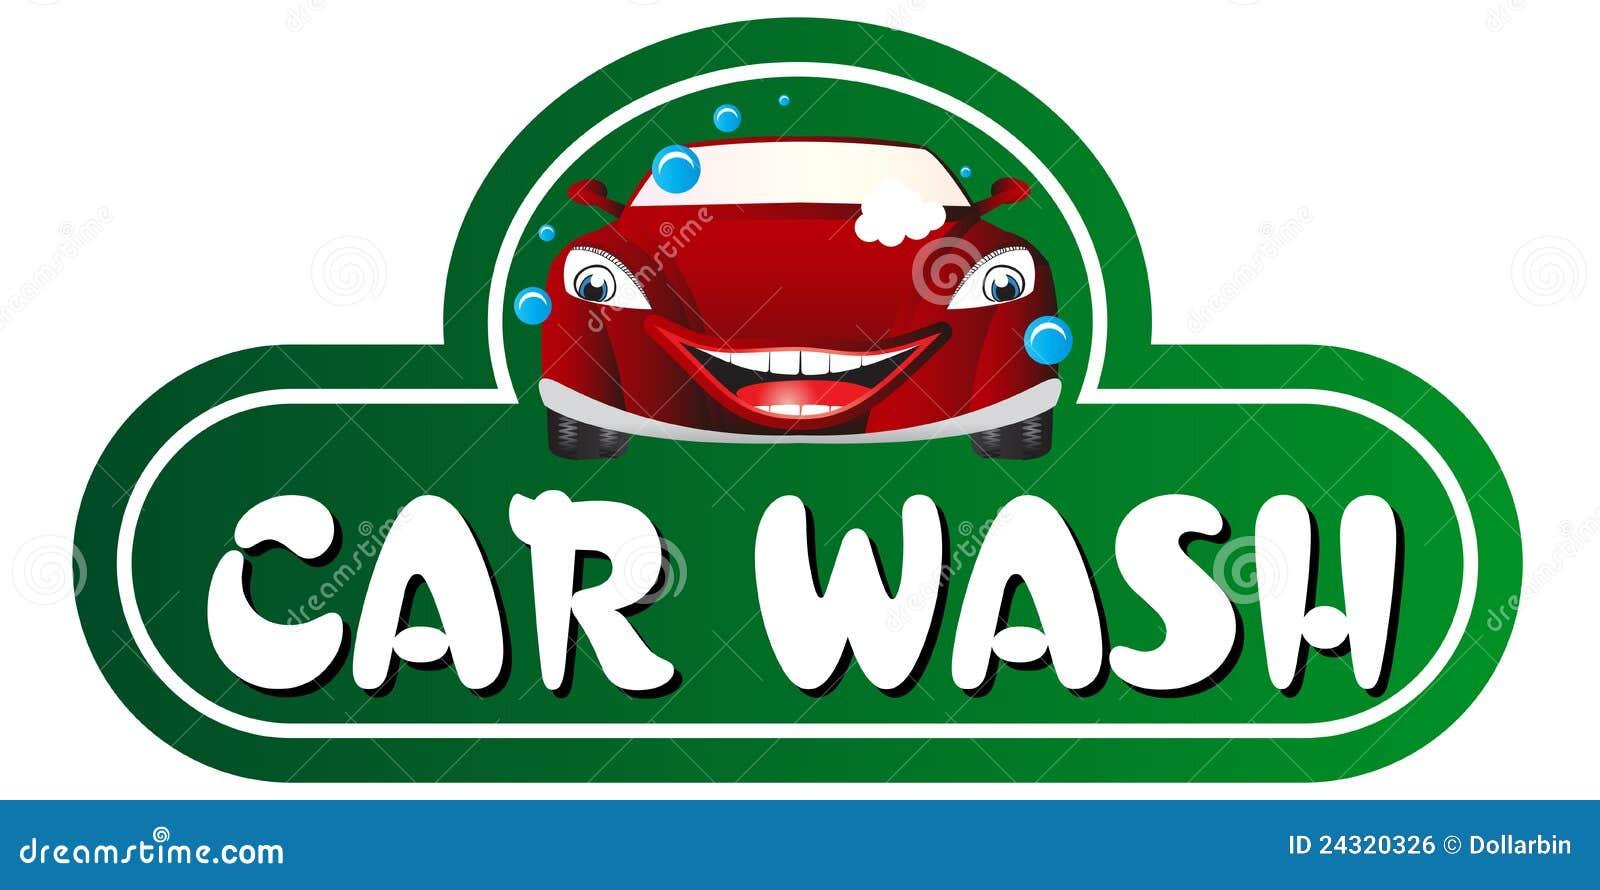 car wash stock vector illustration of black commercial 24320326 rh dreamstime com car wash clip art free download car wash clipart png